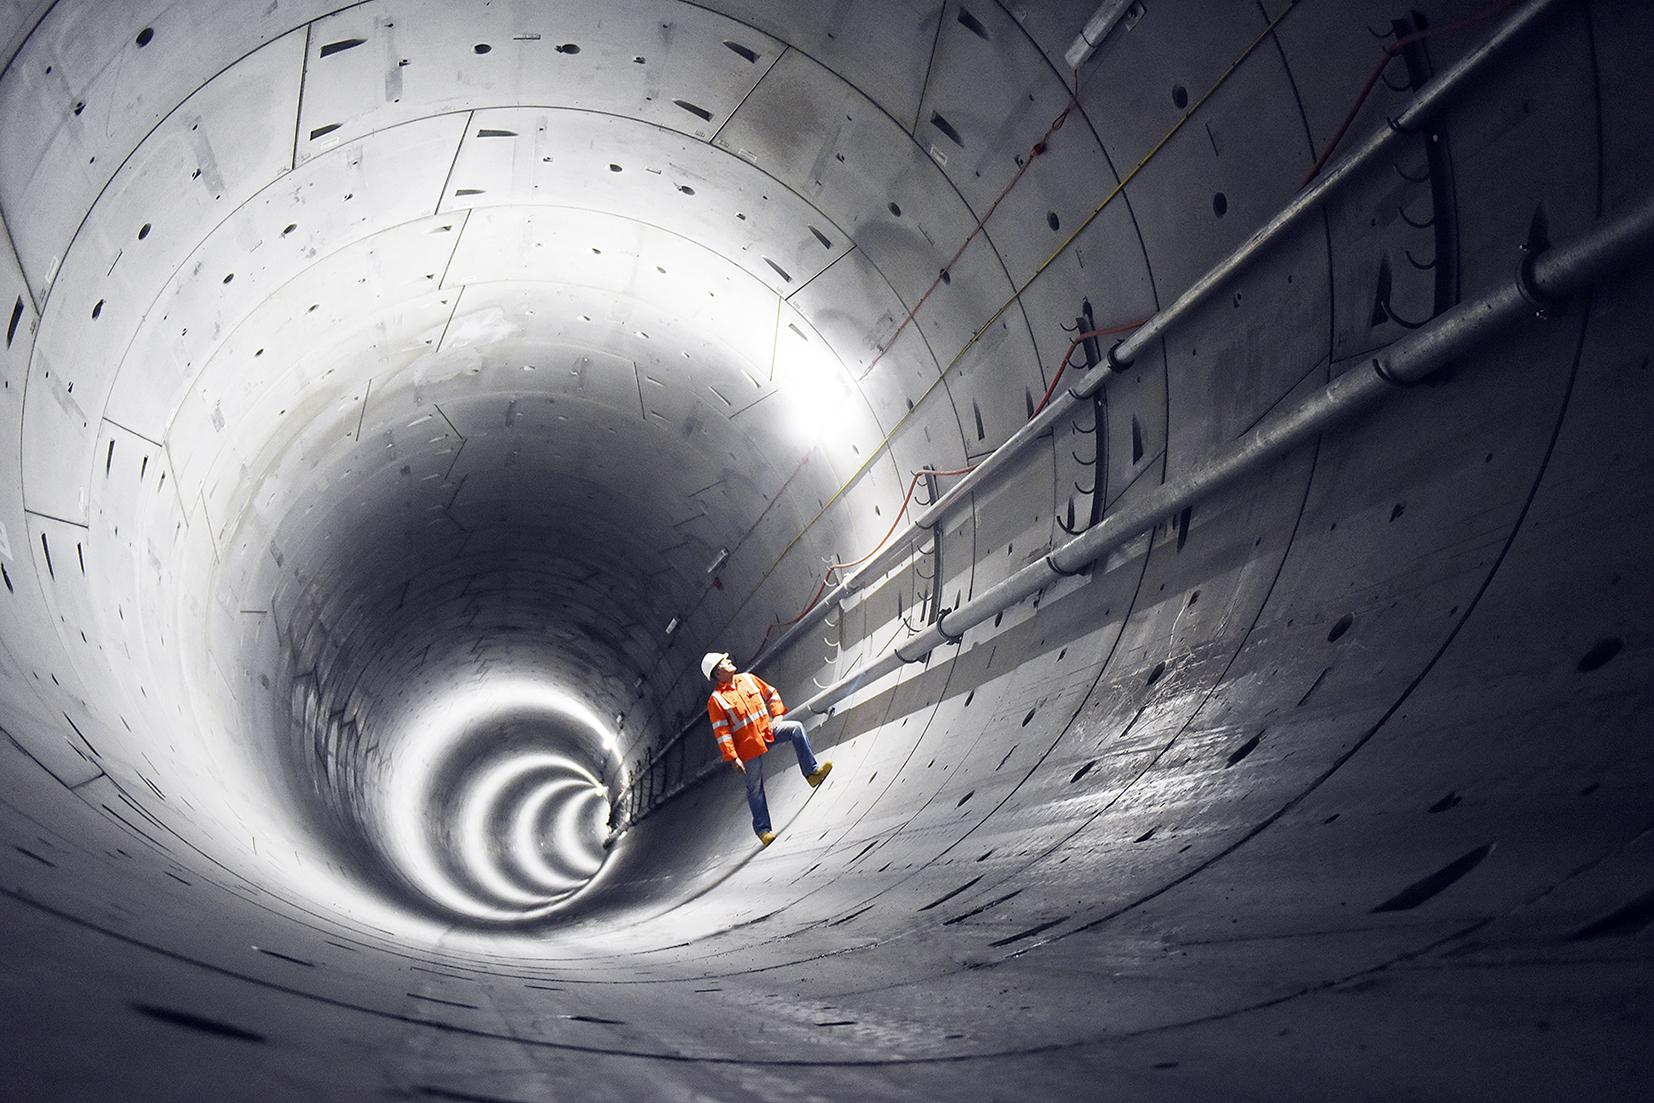 Sydney_metro_-_tunnels_-_june_2016_-_25m_under_castle_hill